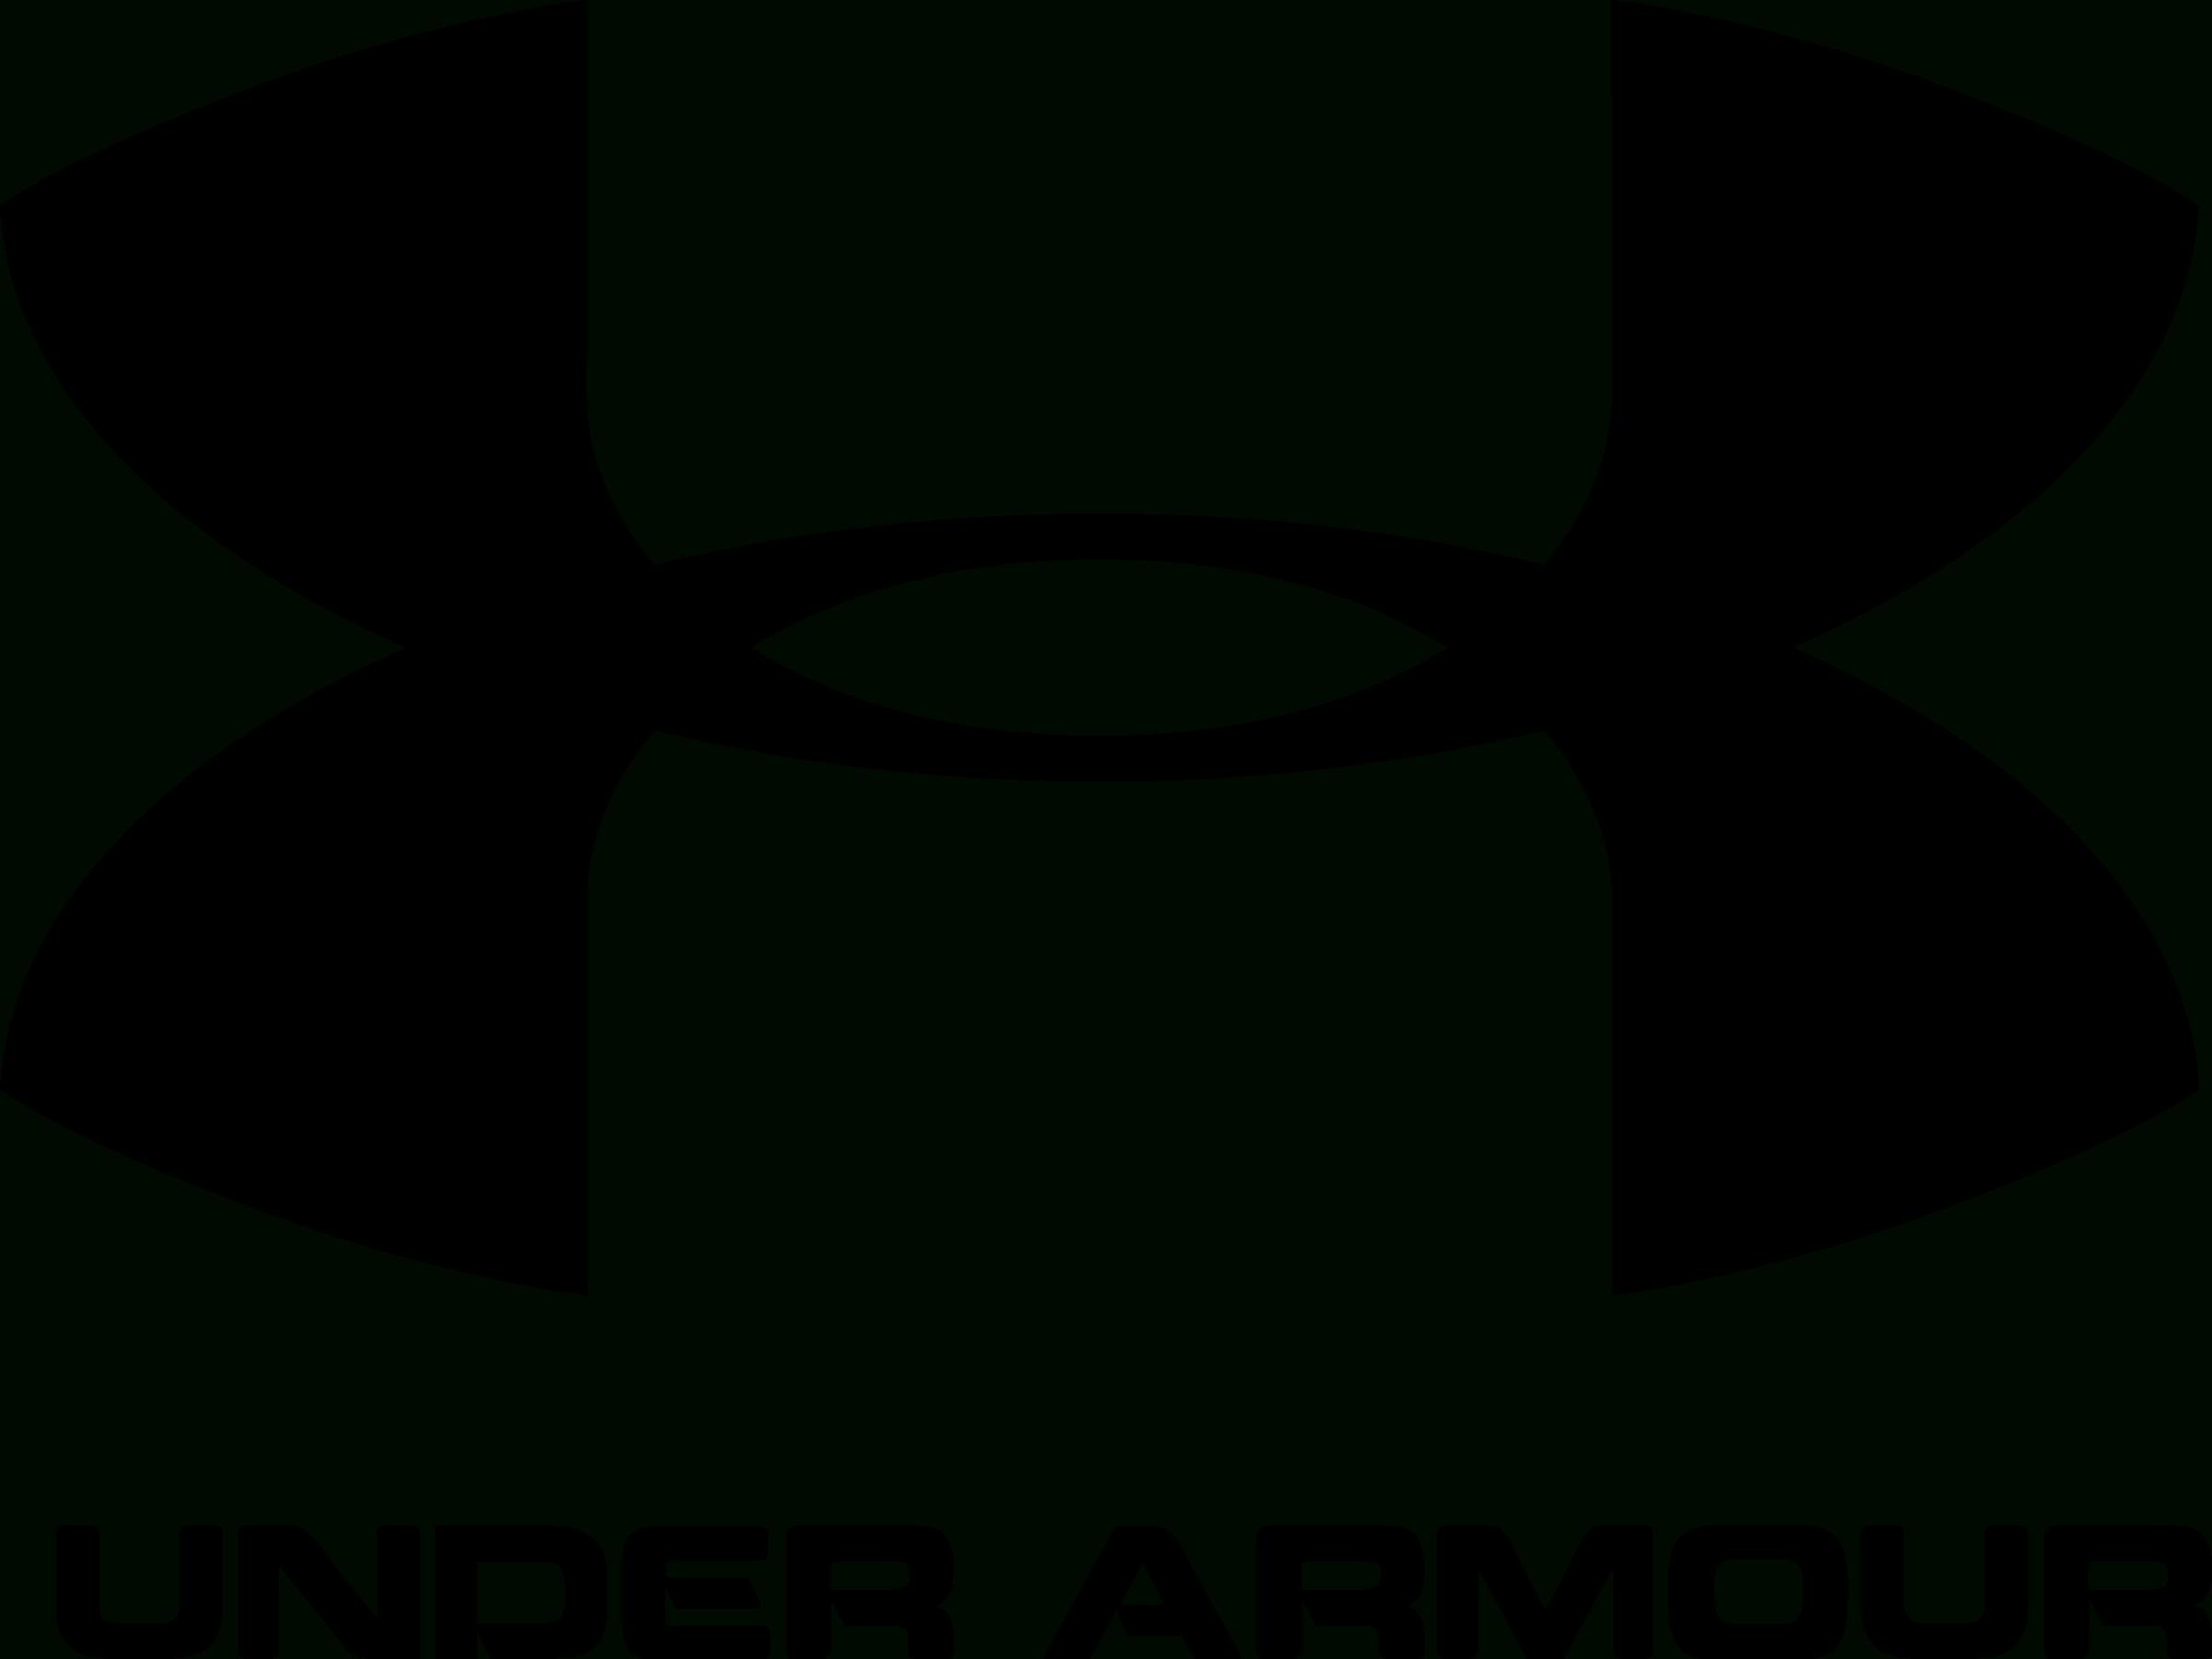 under armour logo png transparent & svg vector - freebie supply